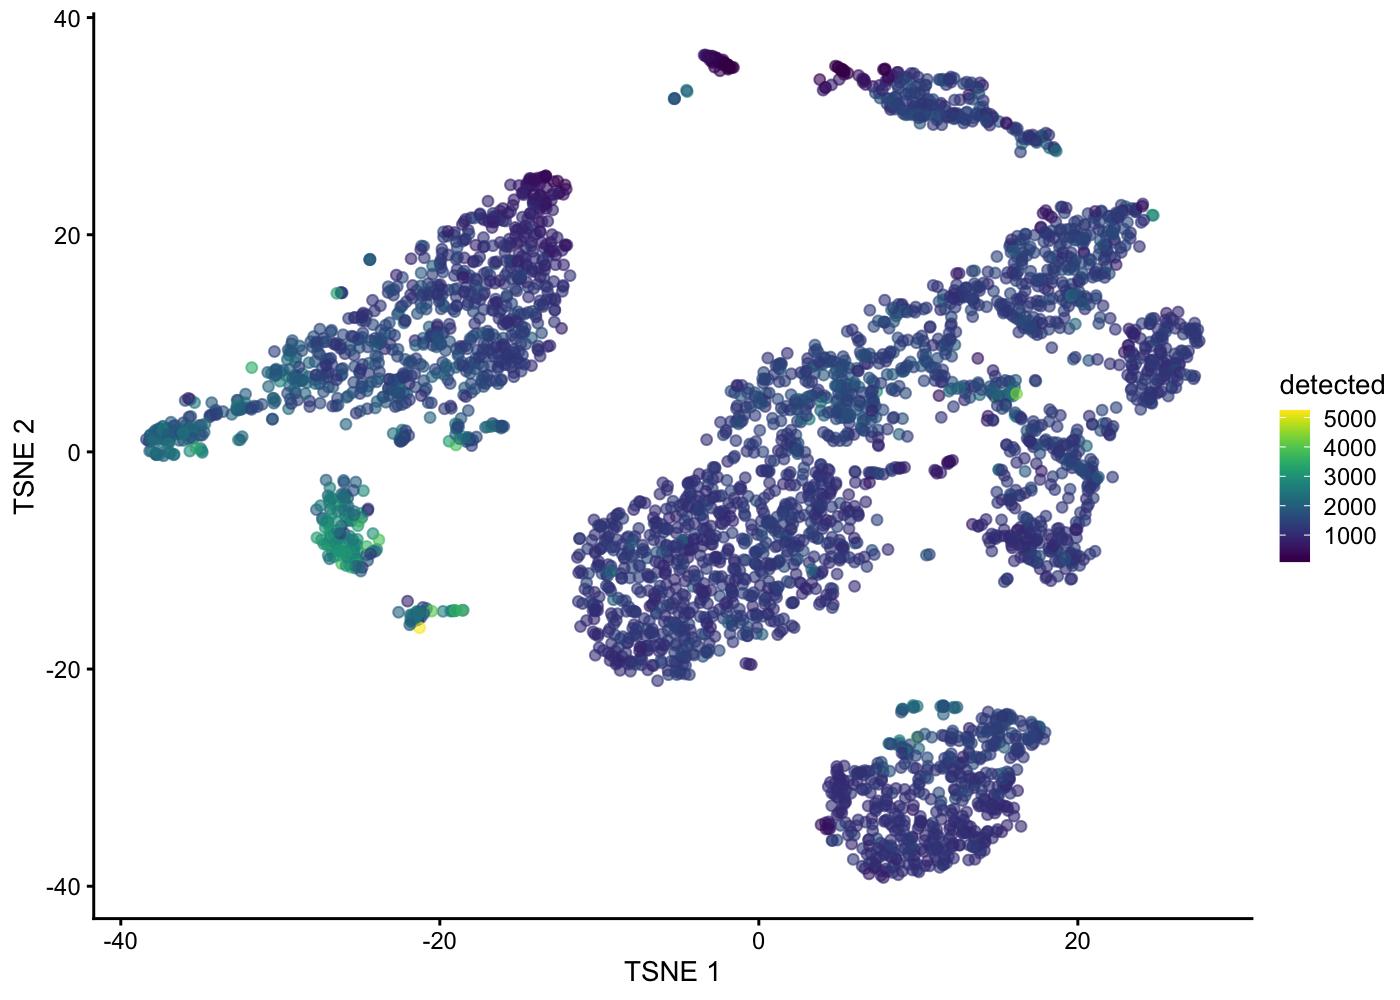 public/figure/sahmri_analysis-workflow.Rmd/tsne_plot-1.png